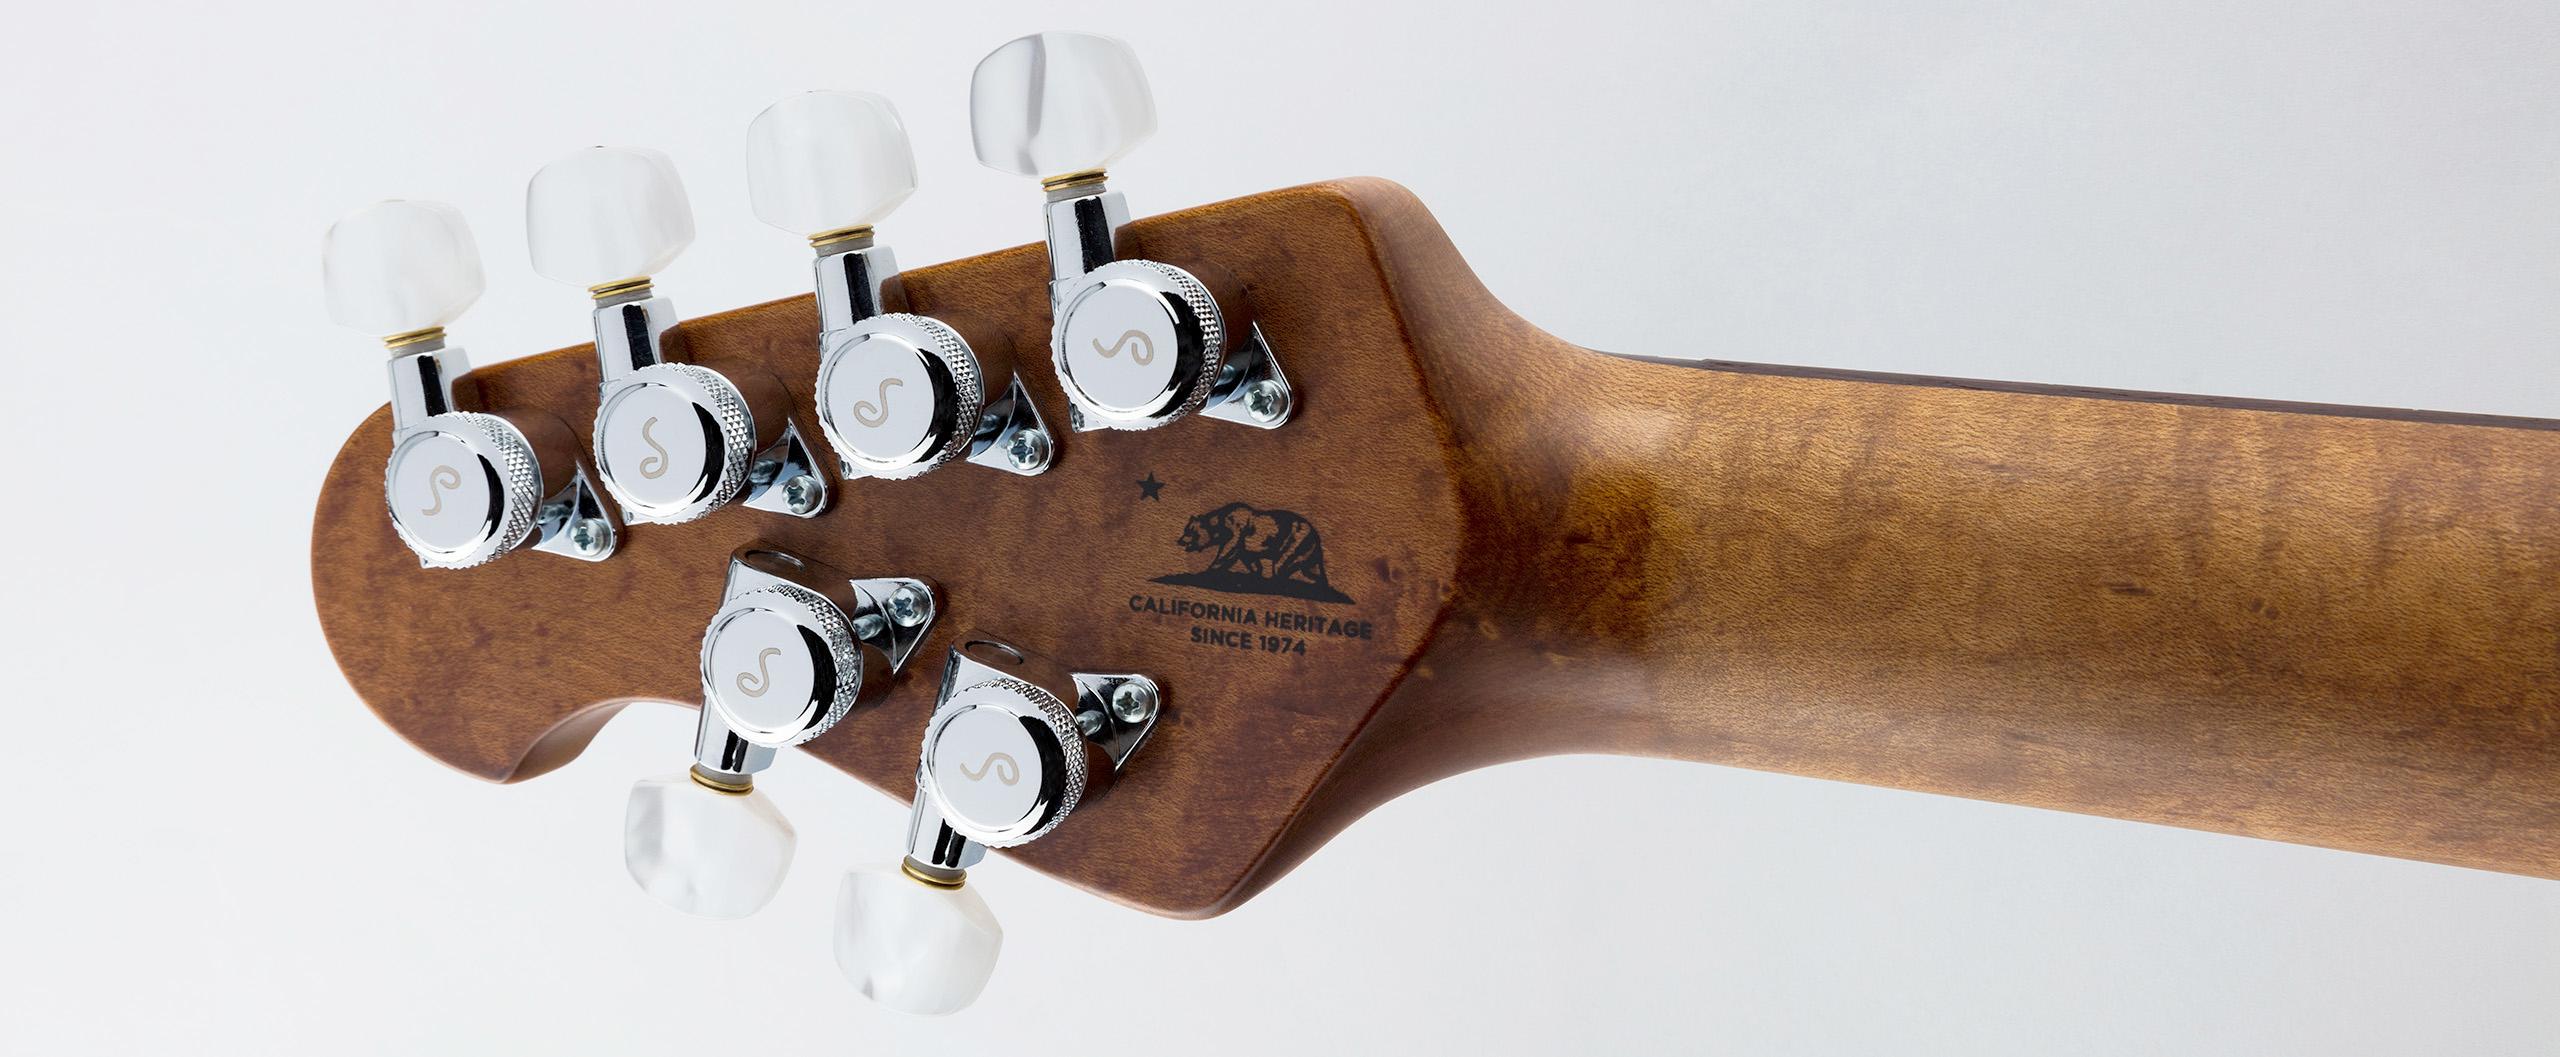 St Vincent 2018 Guitars Ernie Ball Music Man Ab Chance Wiring Diagrams Slide